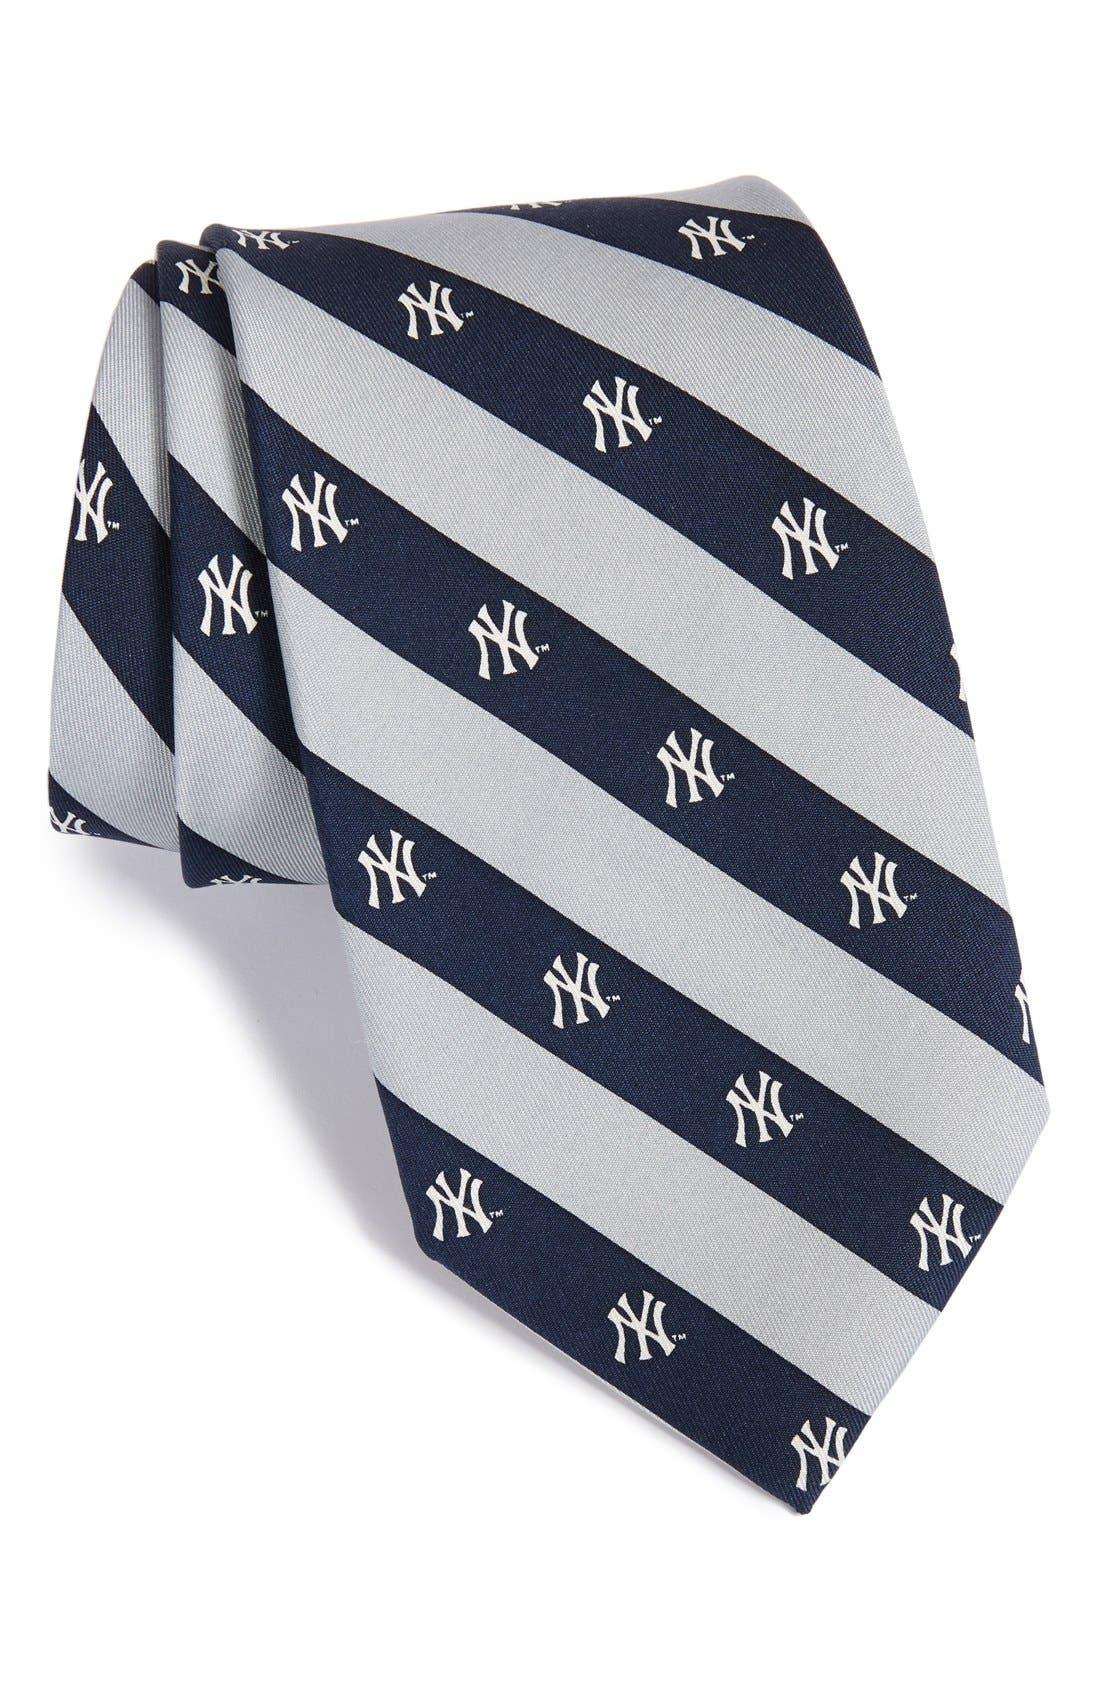 New York Yankees - MLB Print Silk Tie,                             Main thumbnail 1, color,                             414